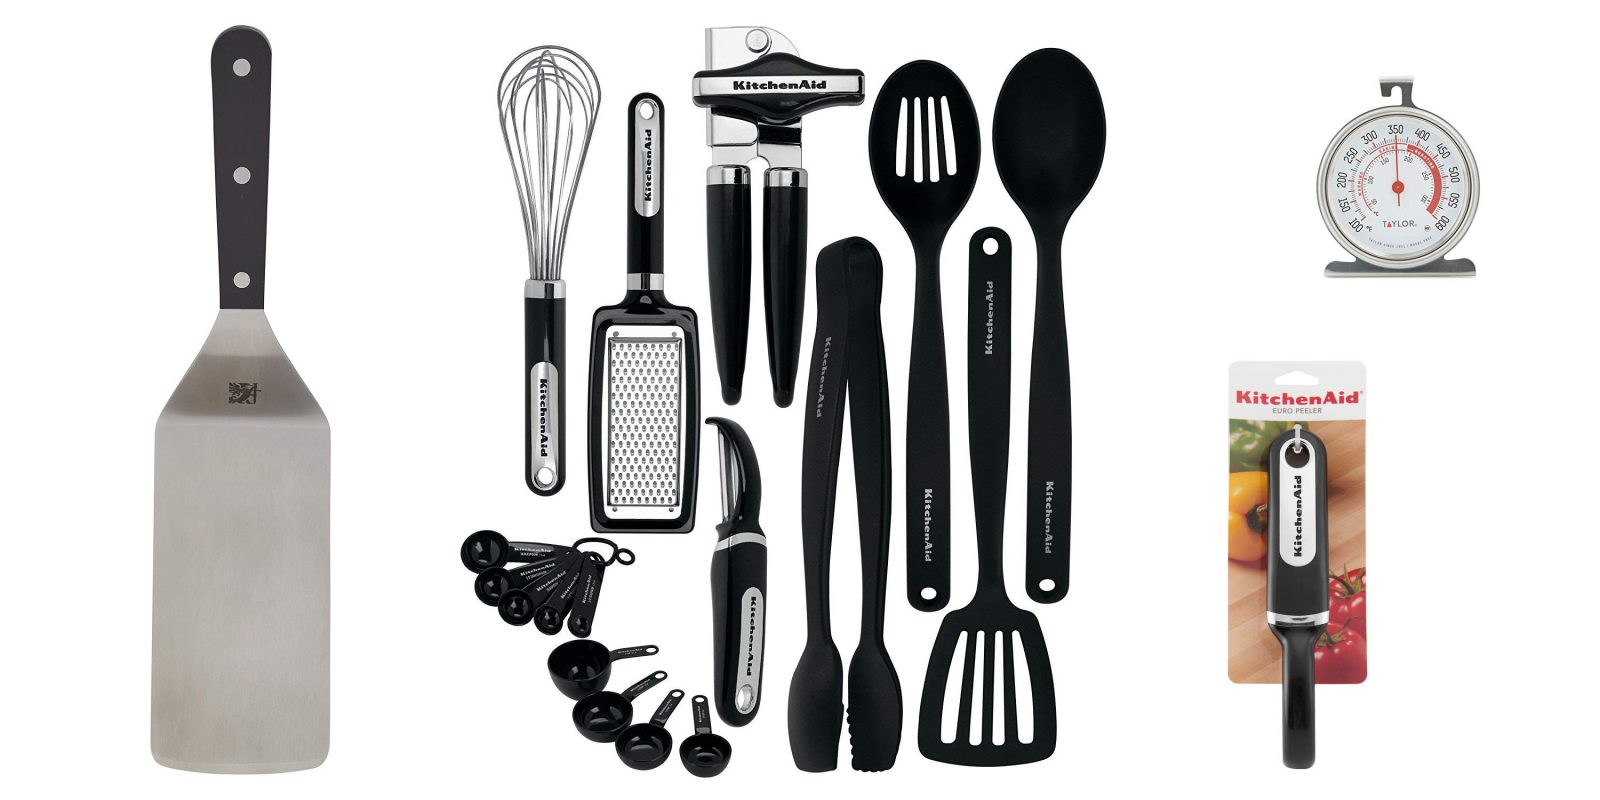 Awesome Amazon 1 Day Kitchenware Sale From 4 50 Kitchenaid Gadget Interior Design Ideas Clesiryabchikinfo